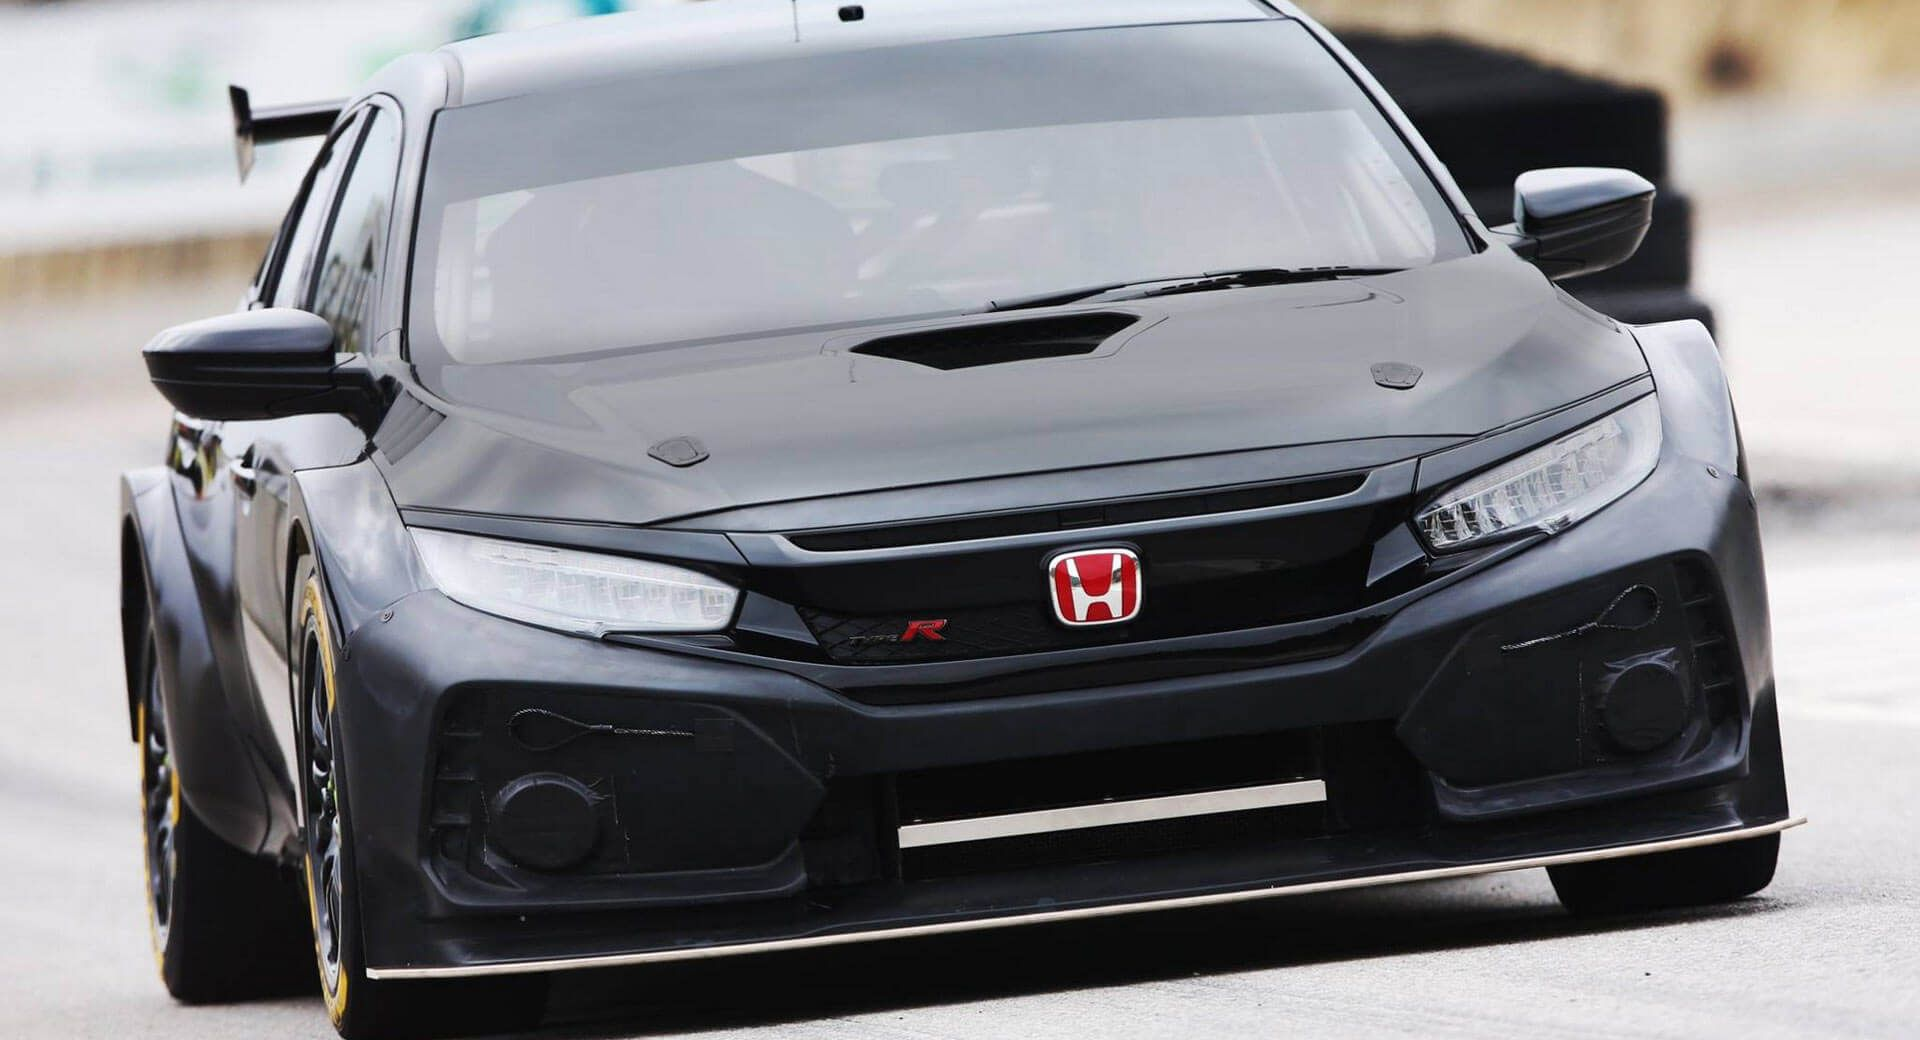 New Widebody Honda Civic Type R For 2018 Btcc Is A True Boy Racer Carscoops Honda Civic Type R Honda Civic Tuner Cars Honda